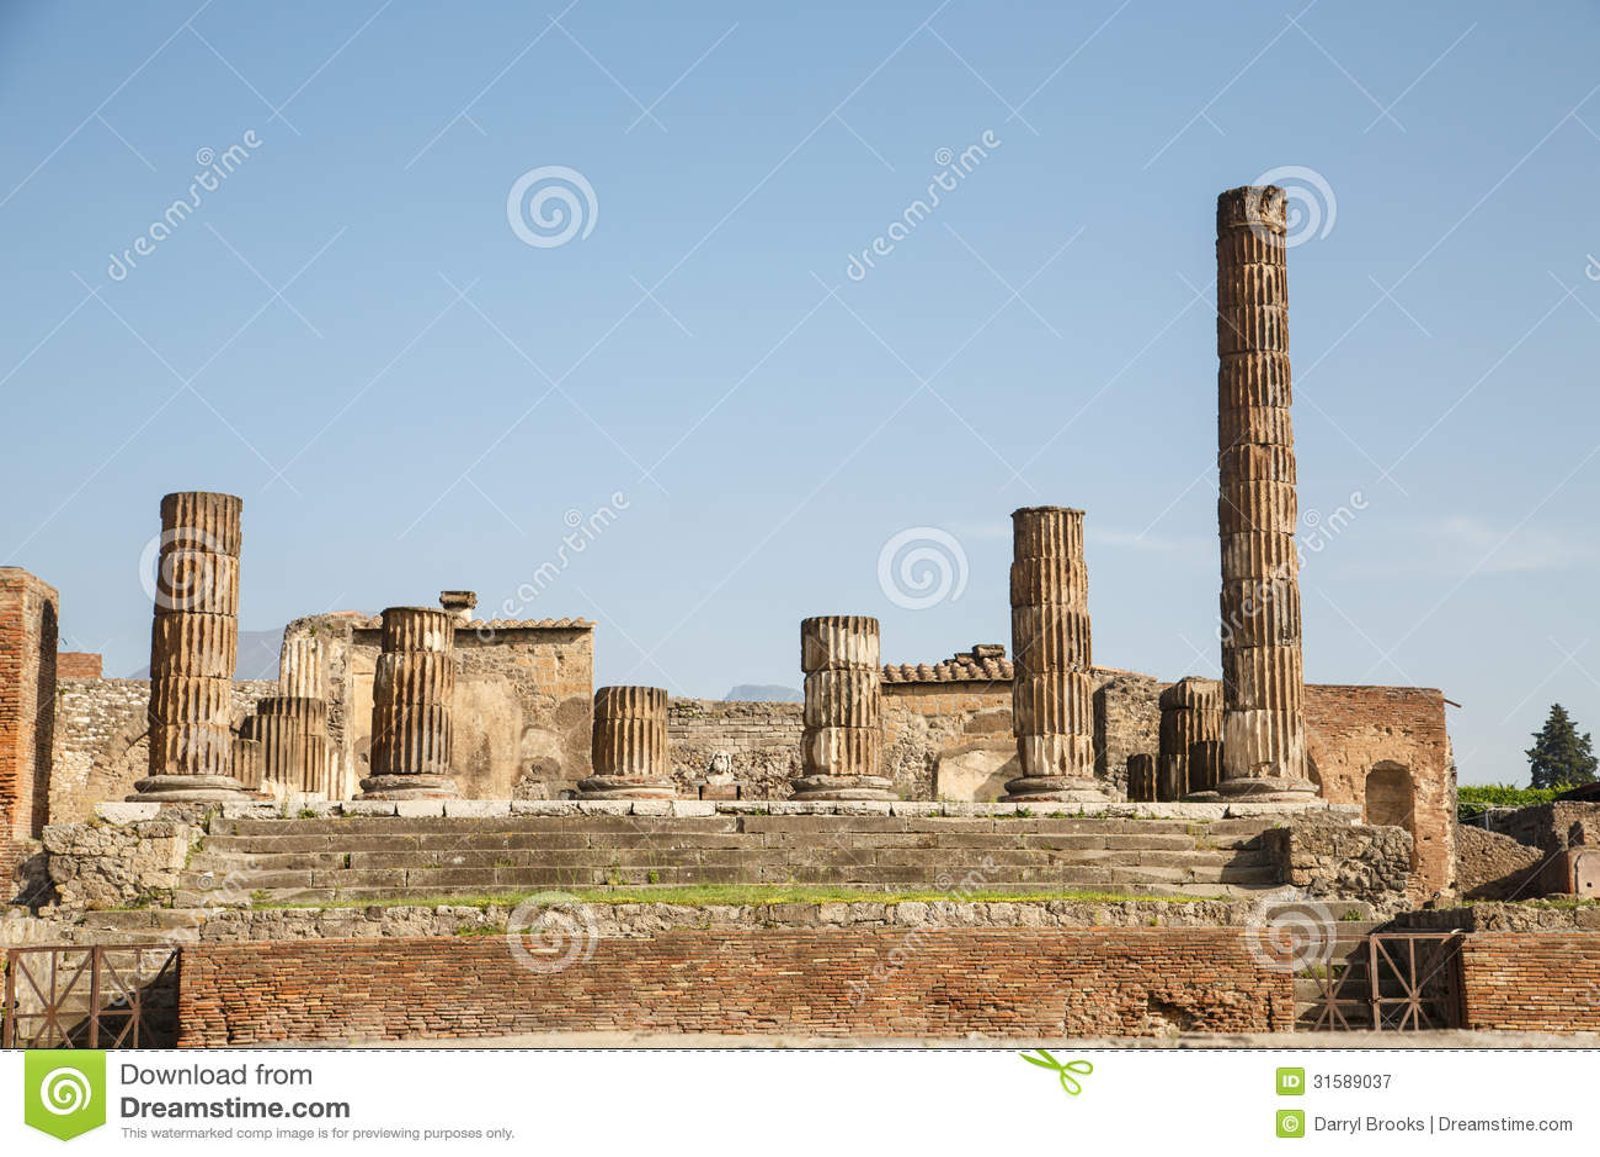 Broken Stone Pillar : Broken columns in pompeii royalty free stock photography